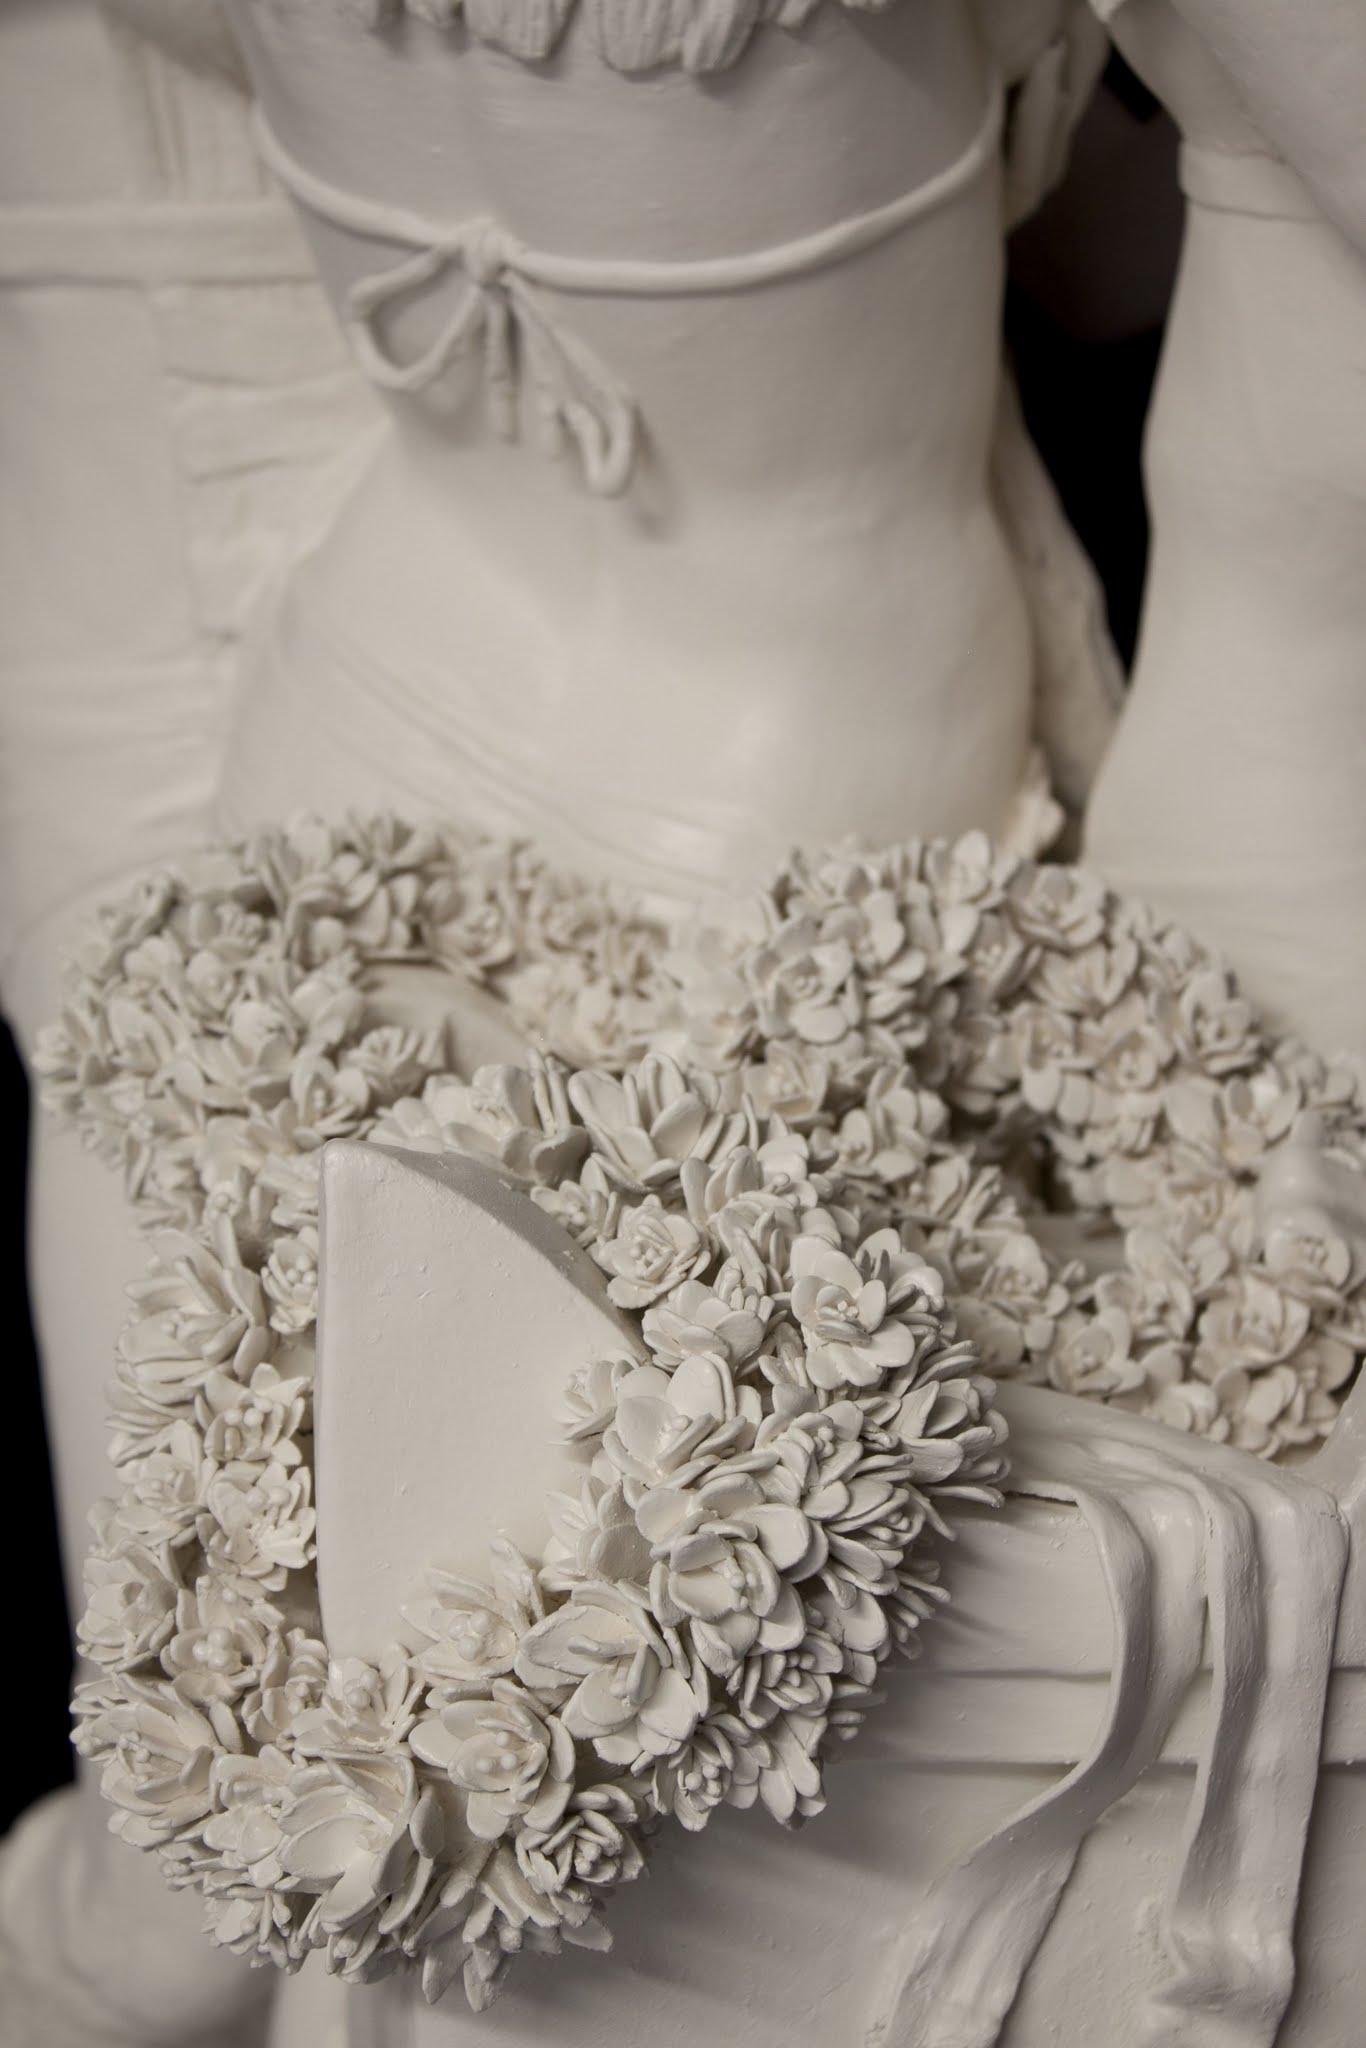 Sarah Hahn Sculpture Kardashians 3